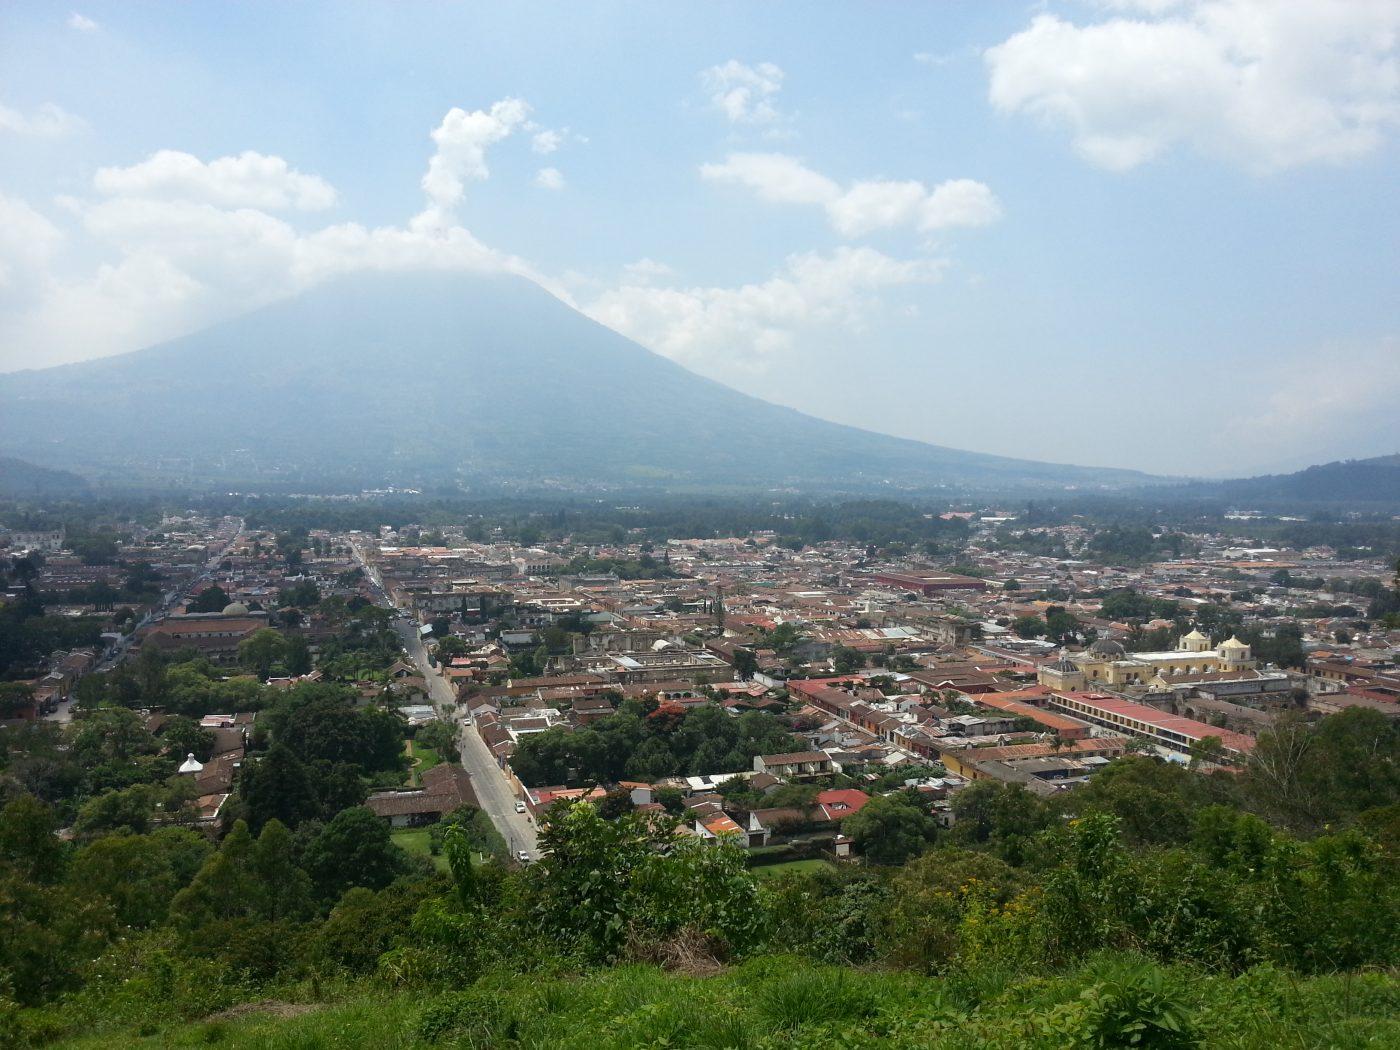 Things to do in Guatemala: beautiful scenery